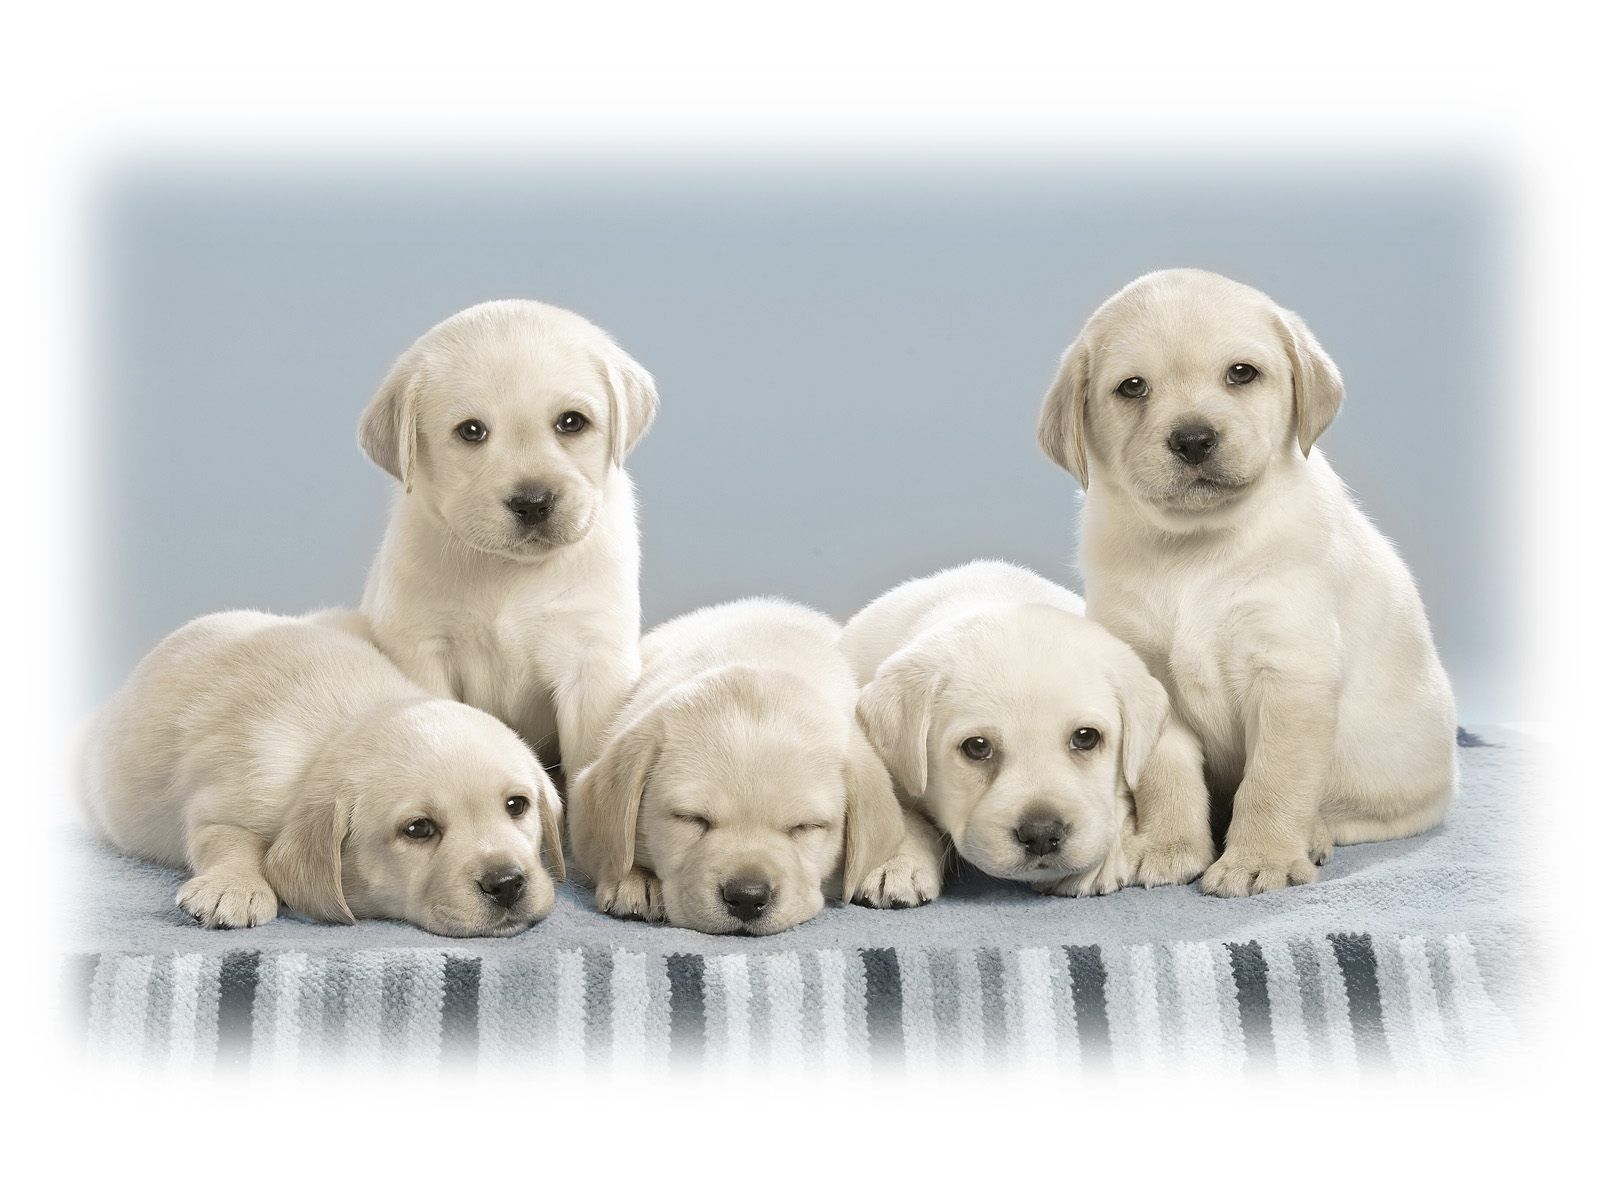 Ideas About Cute Puppy Wallpaper On Pinterest Cute Puppies 1600x1200